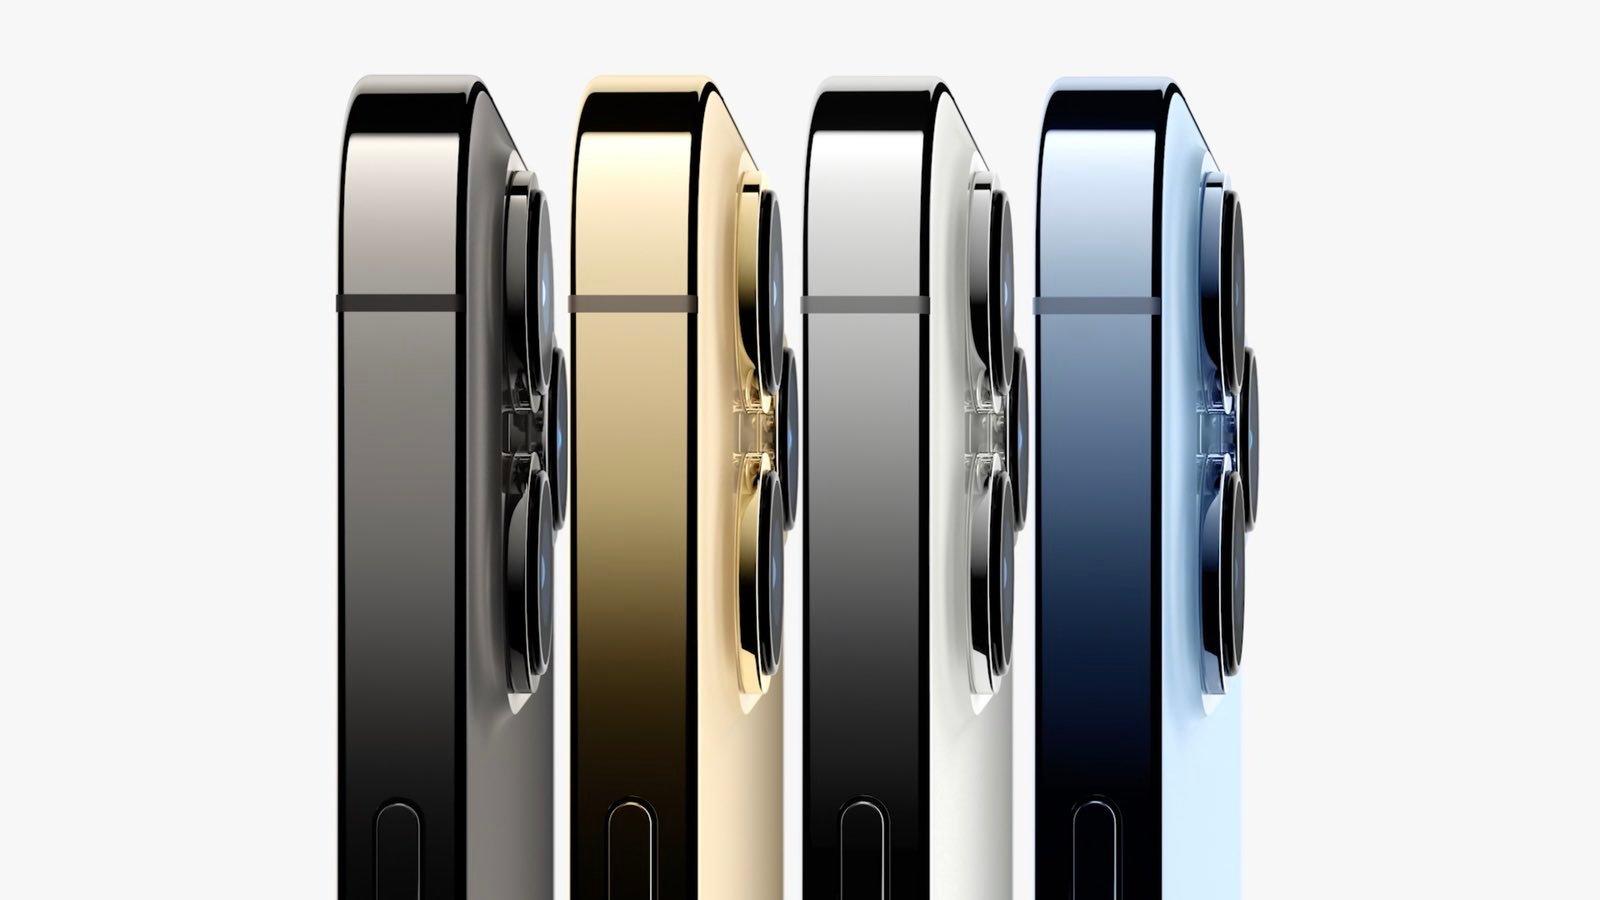 iPhone 13 Pro και iPhone 13 Pro Max διαθέτουν ρυθμό ανανέωσης 120Hz - Φωτογραφία 1